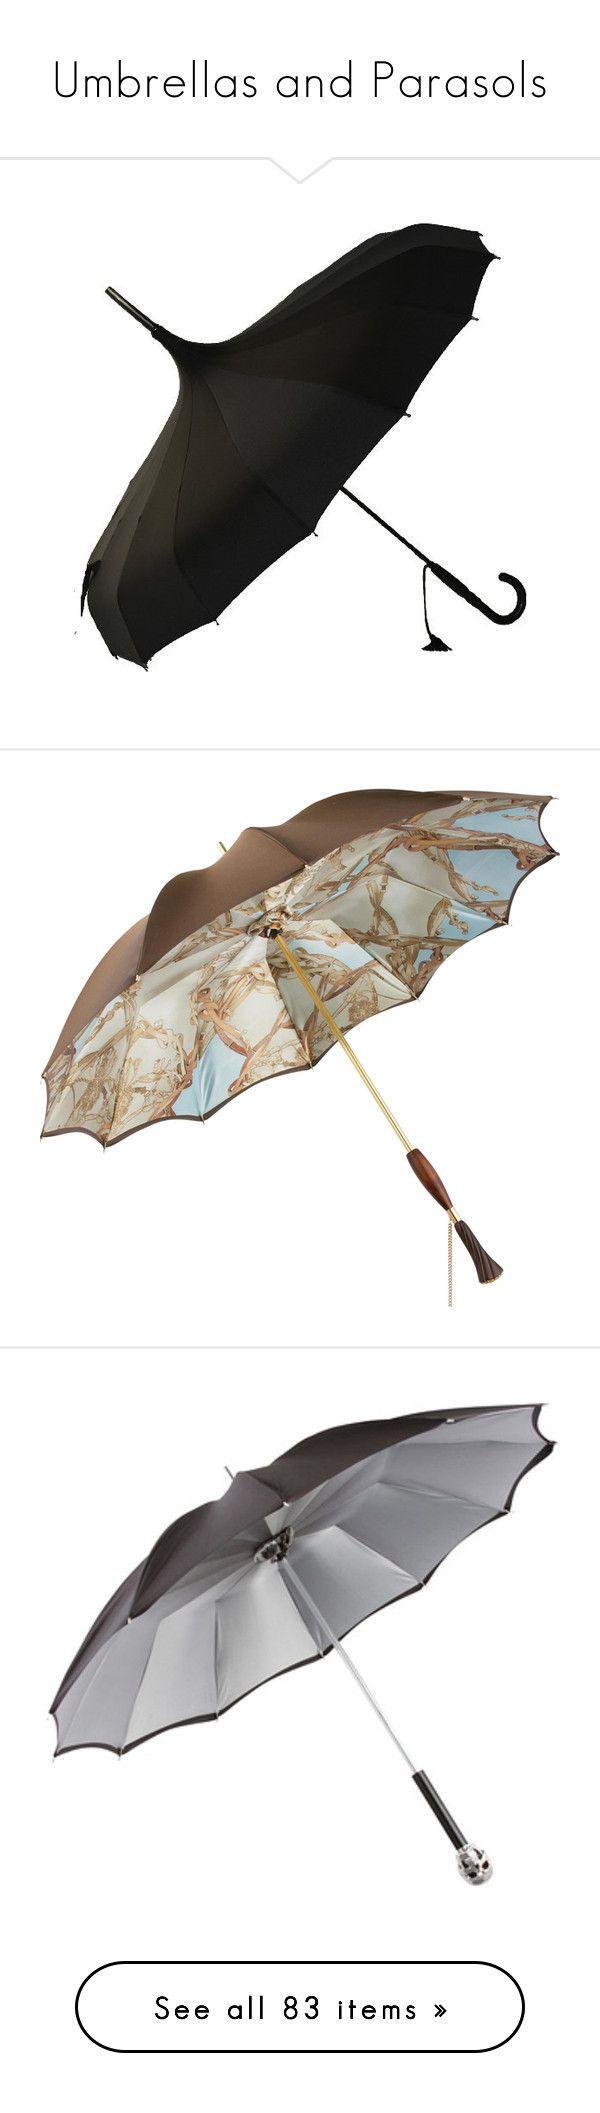 best 25 animal umbrellas ideas on pinterest chipmunks kittens